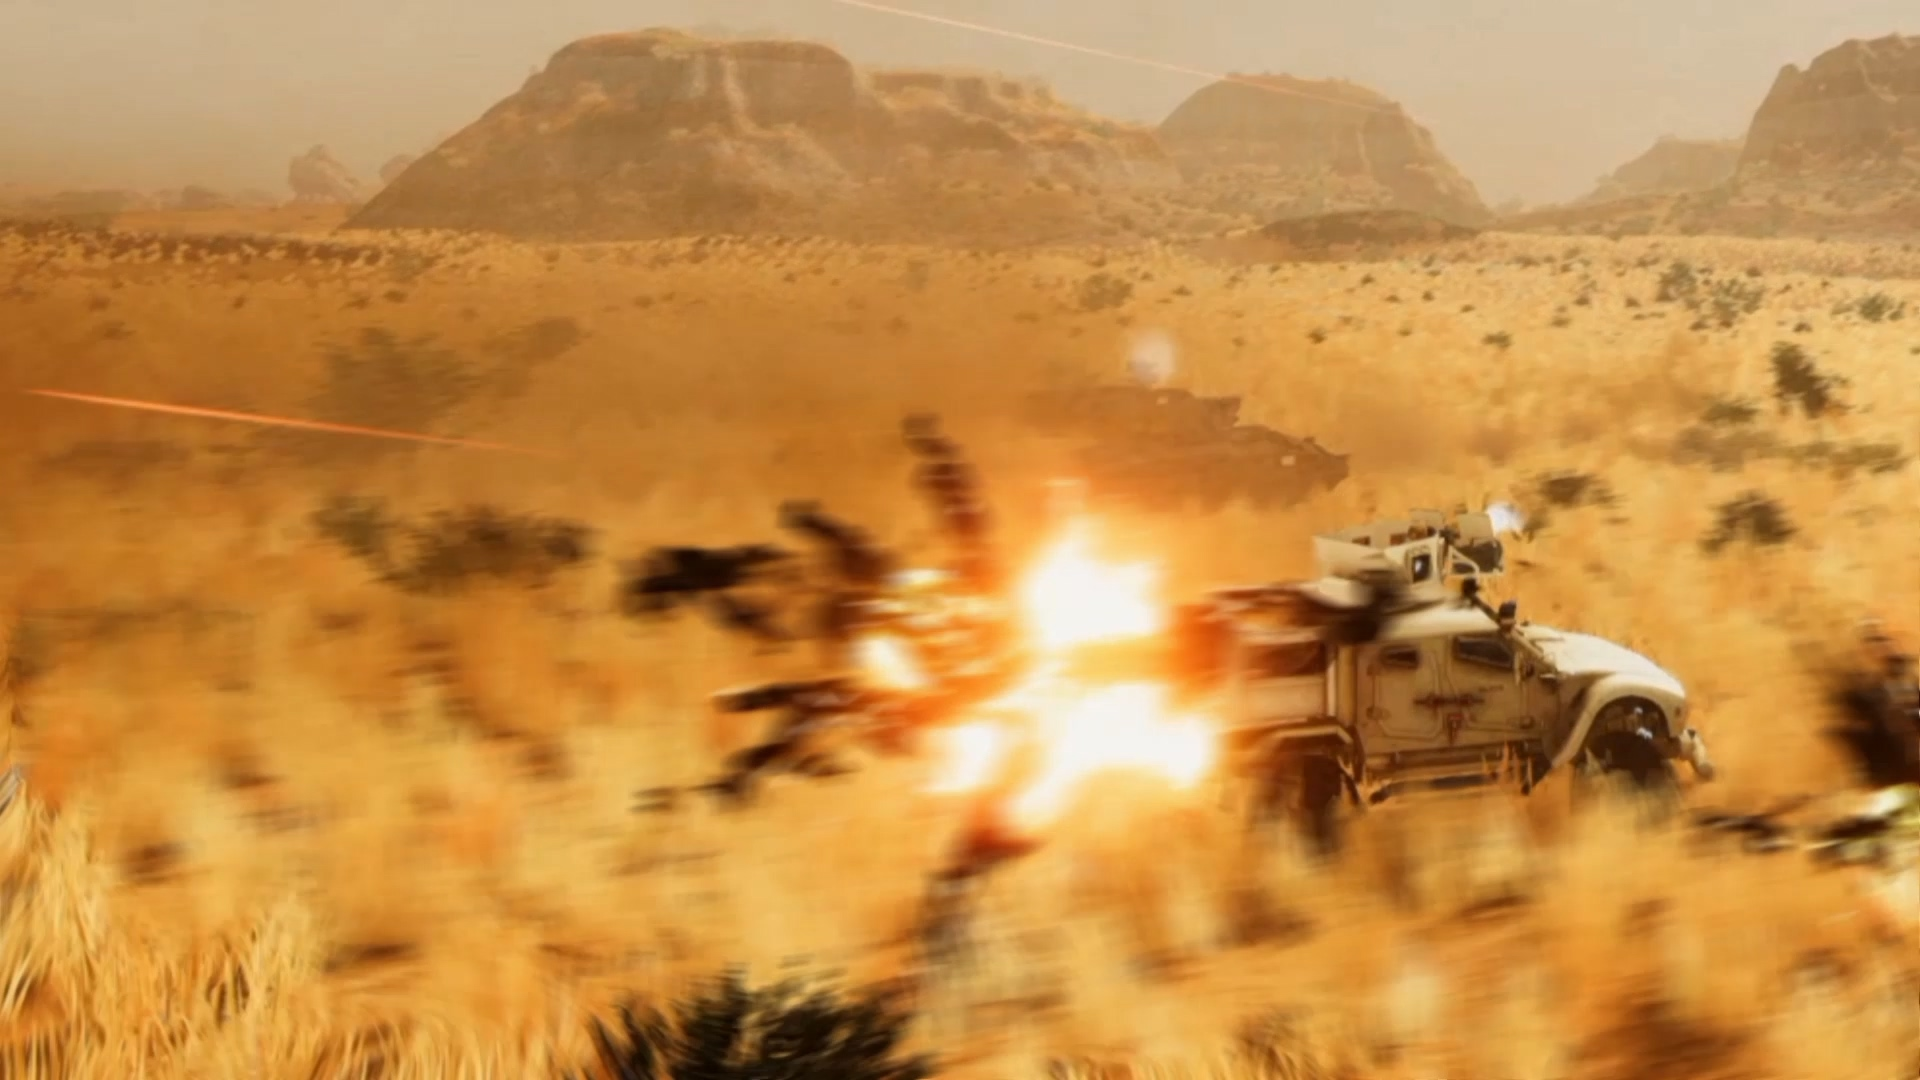 Hunting fields of Jackals screenshot